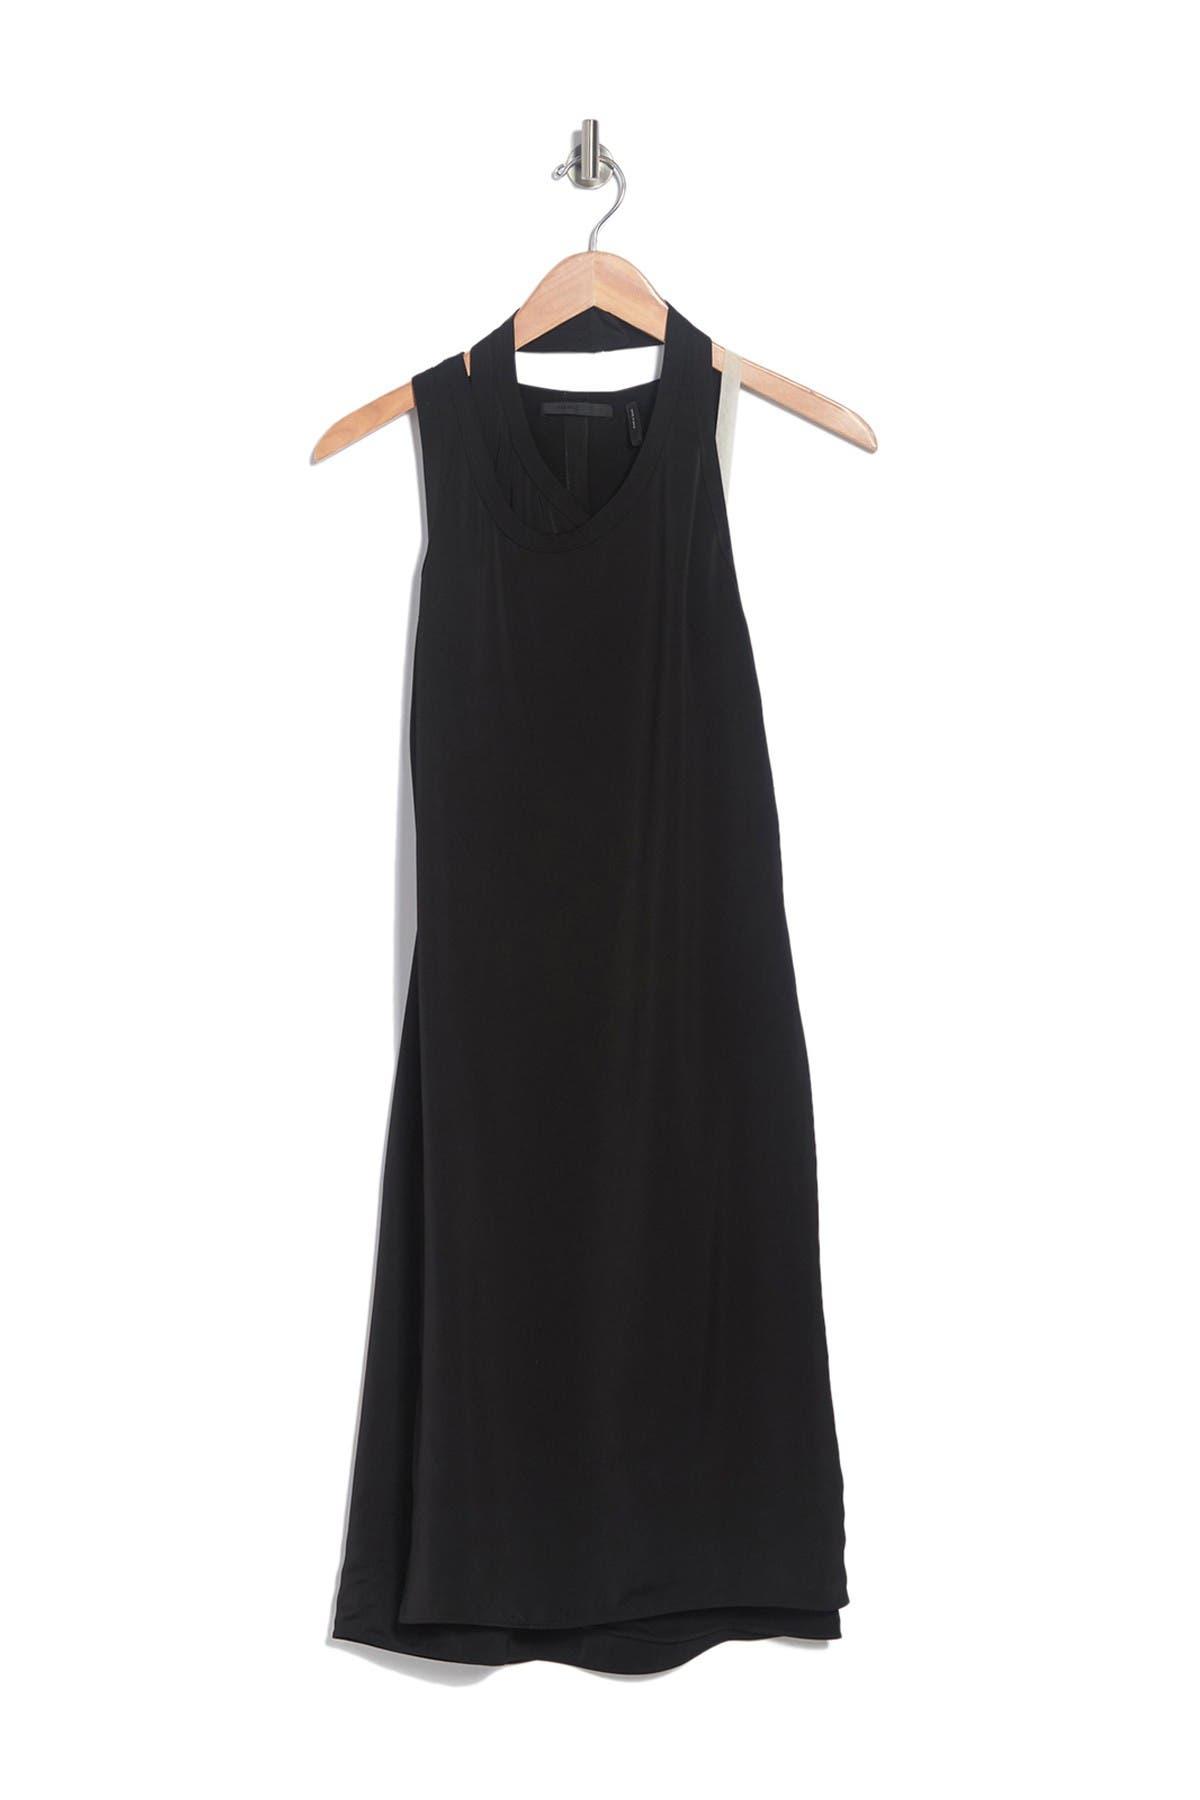 Image of Helmut Lang Double Tank Dress